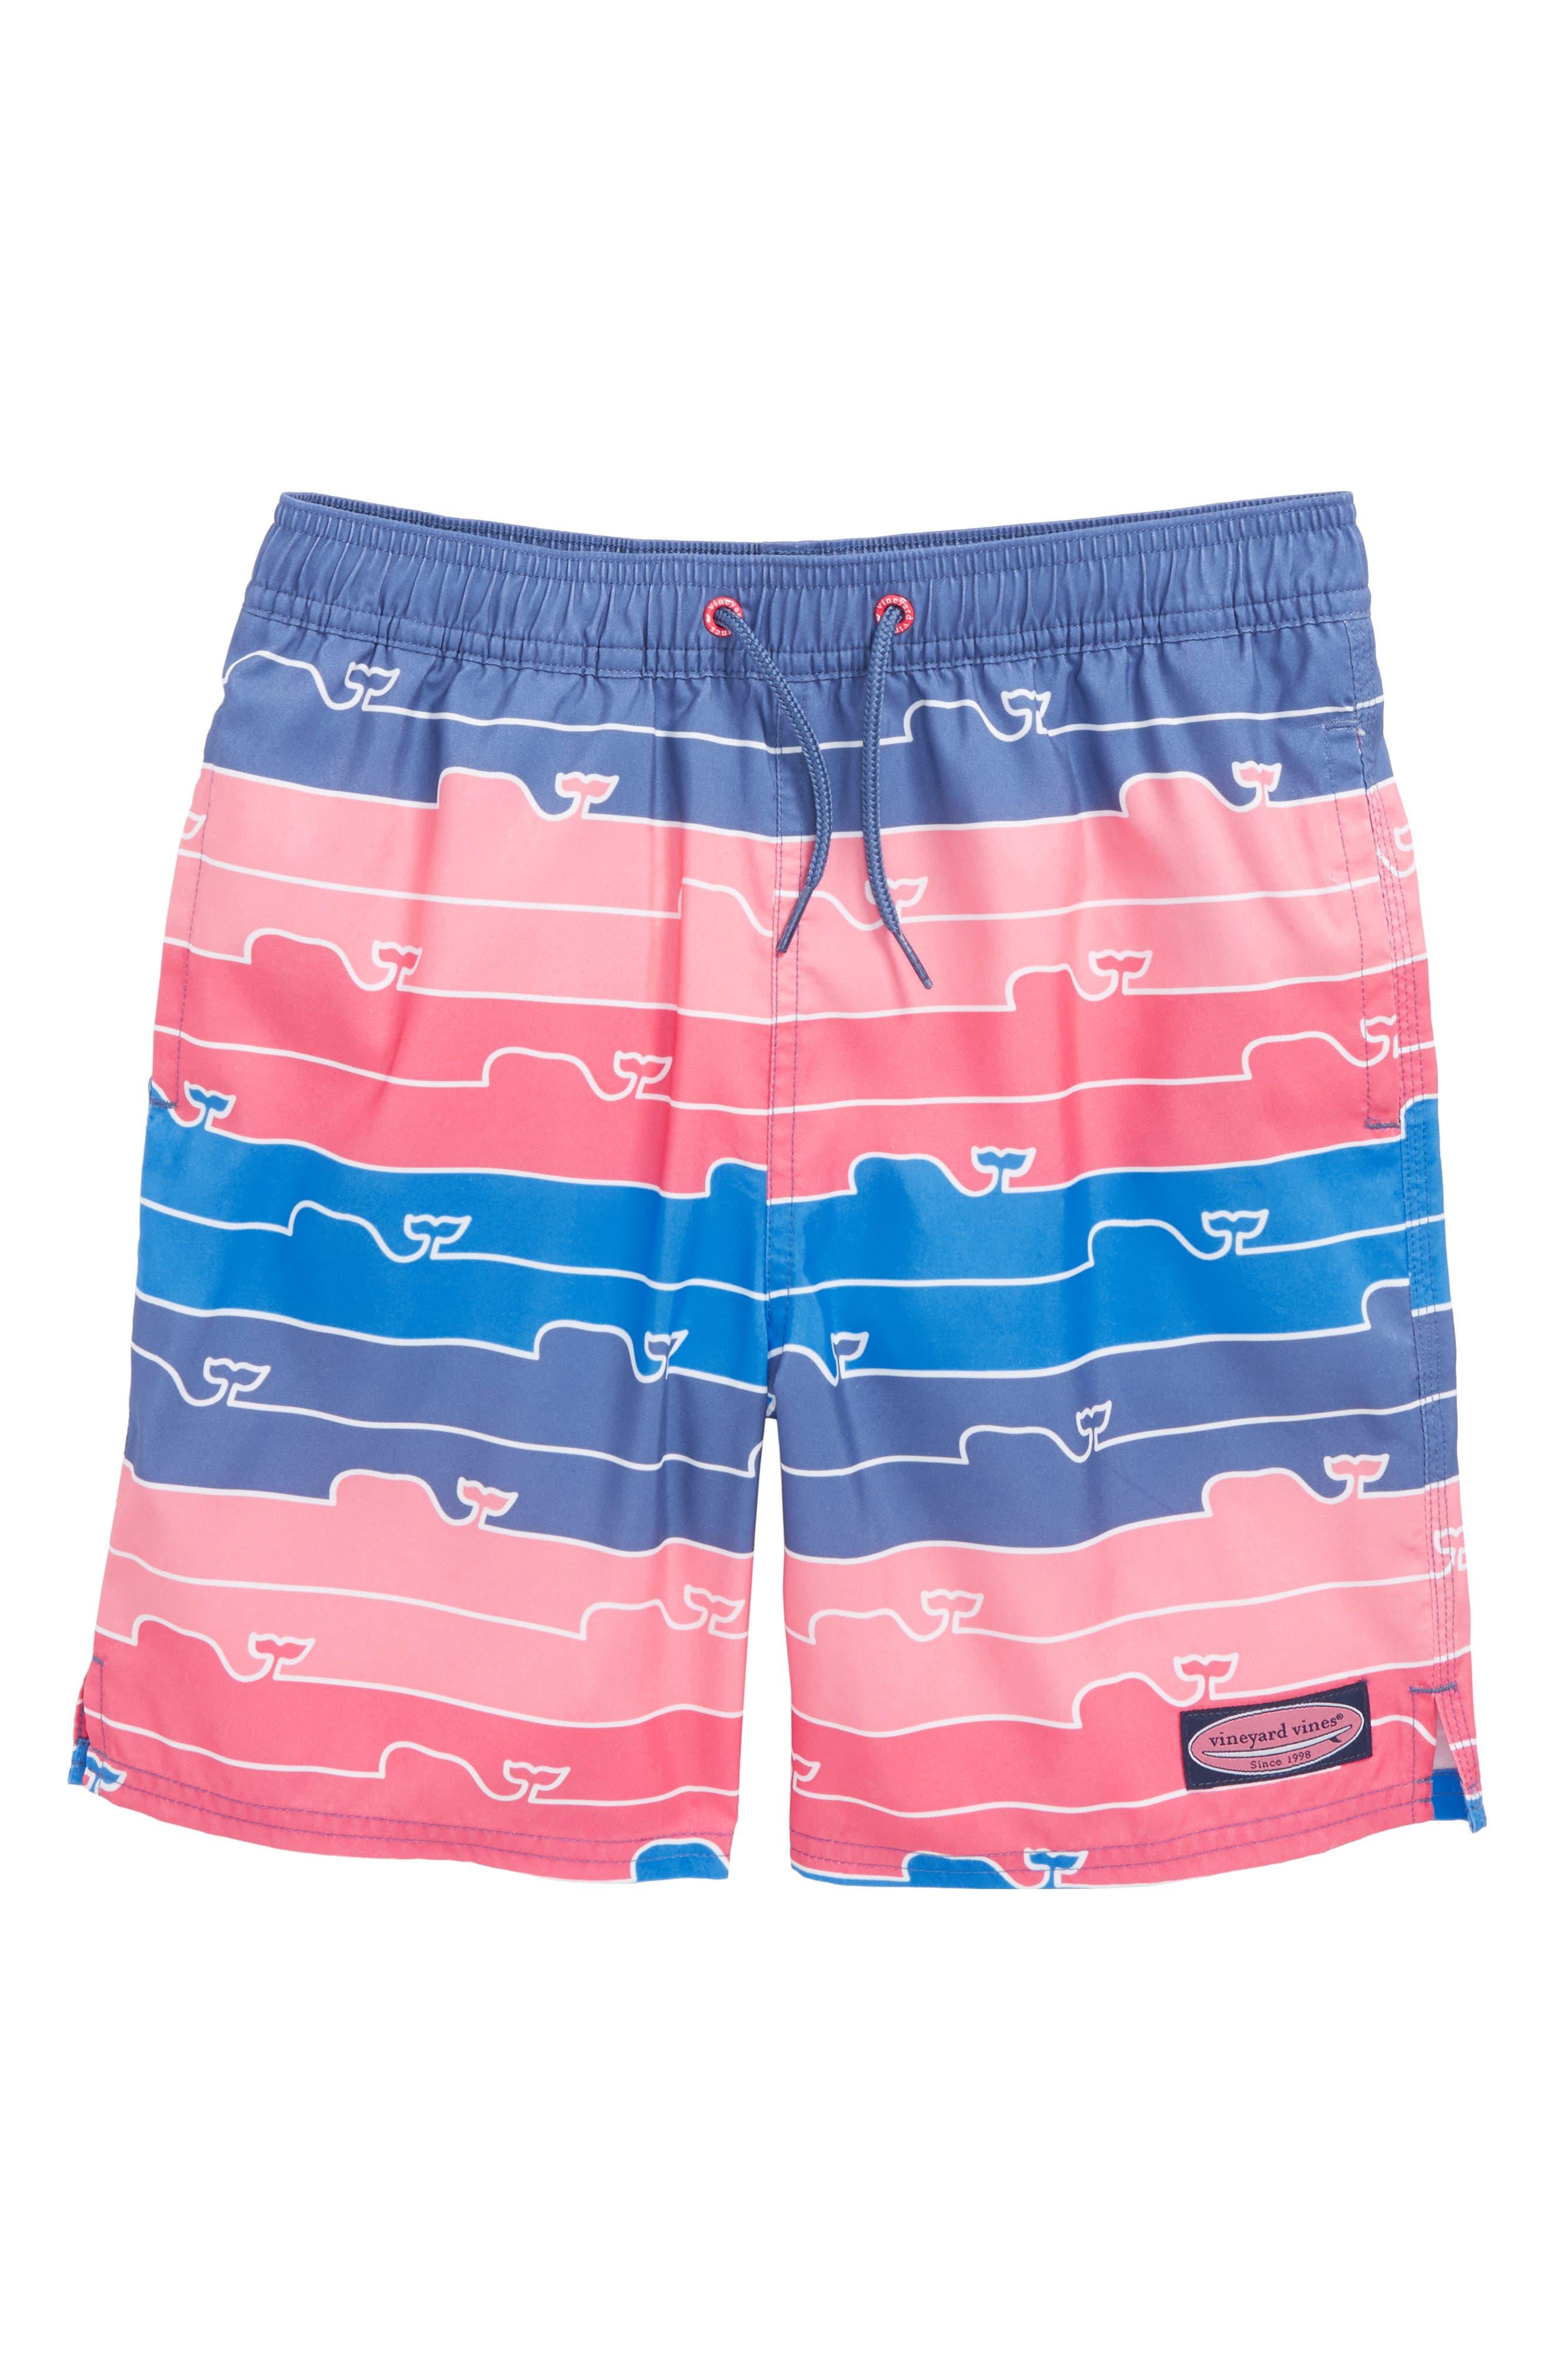 Chappy Whale Line Swim Trunks,                             Main thumbnail 1, color,                             Moonshine